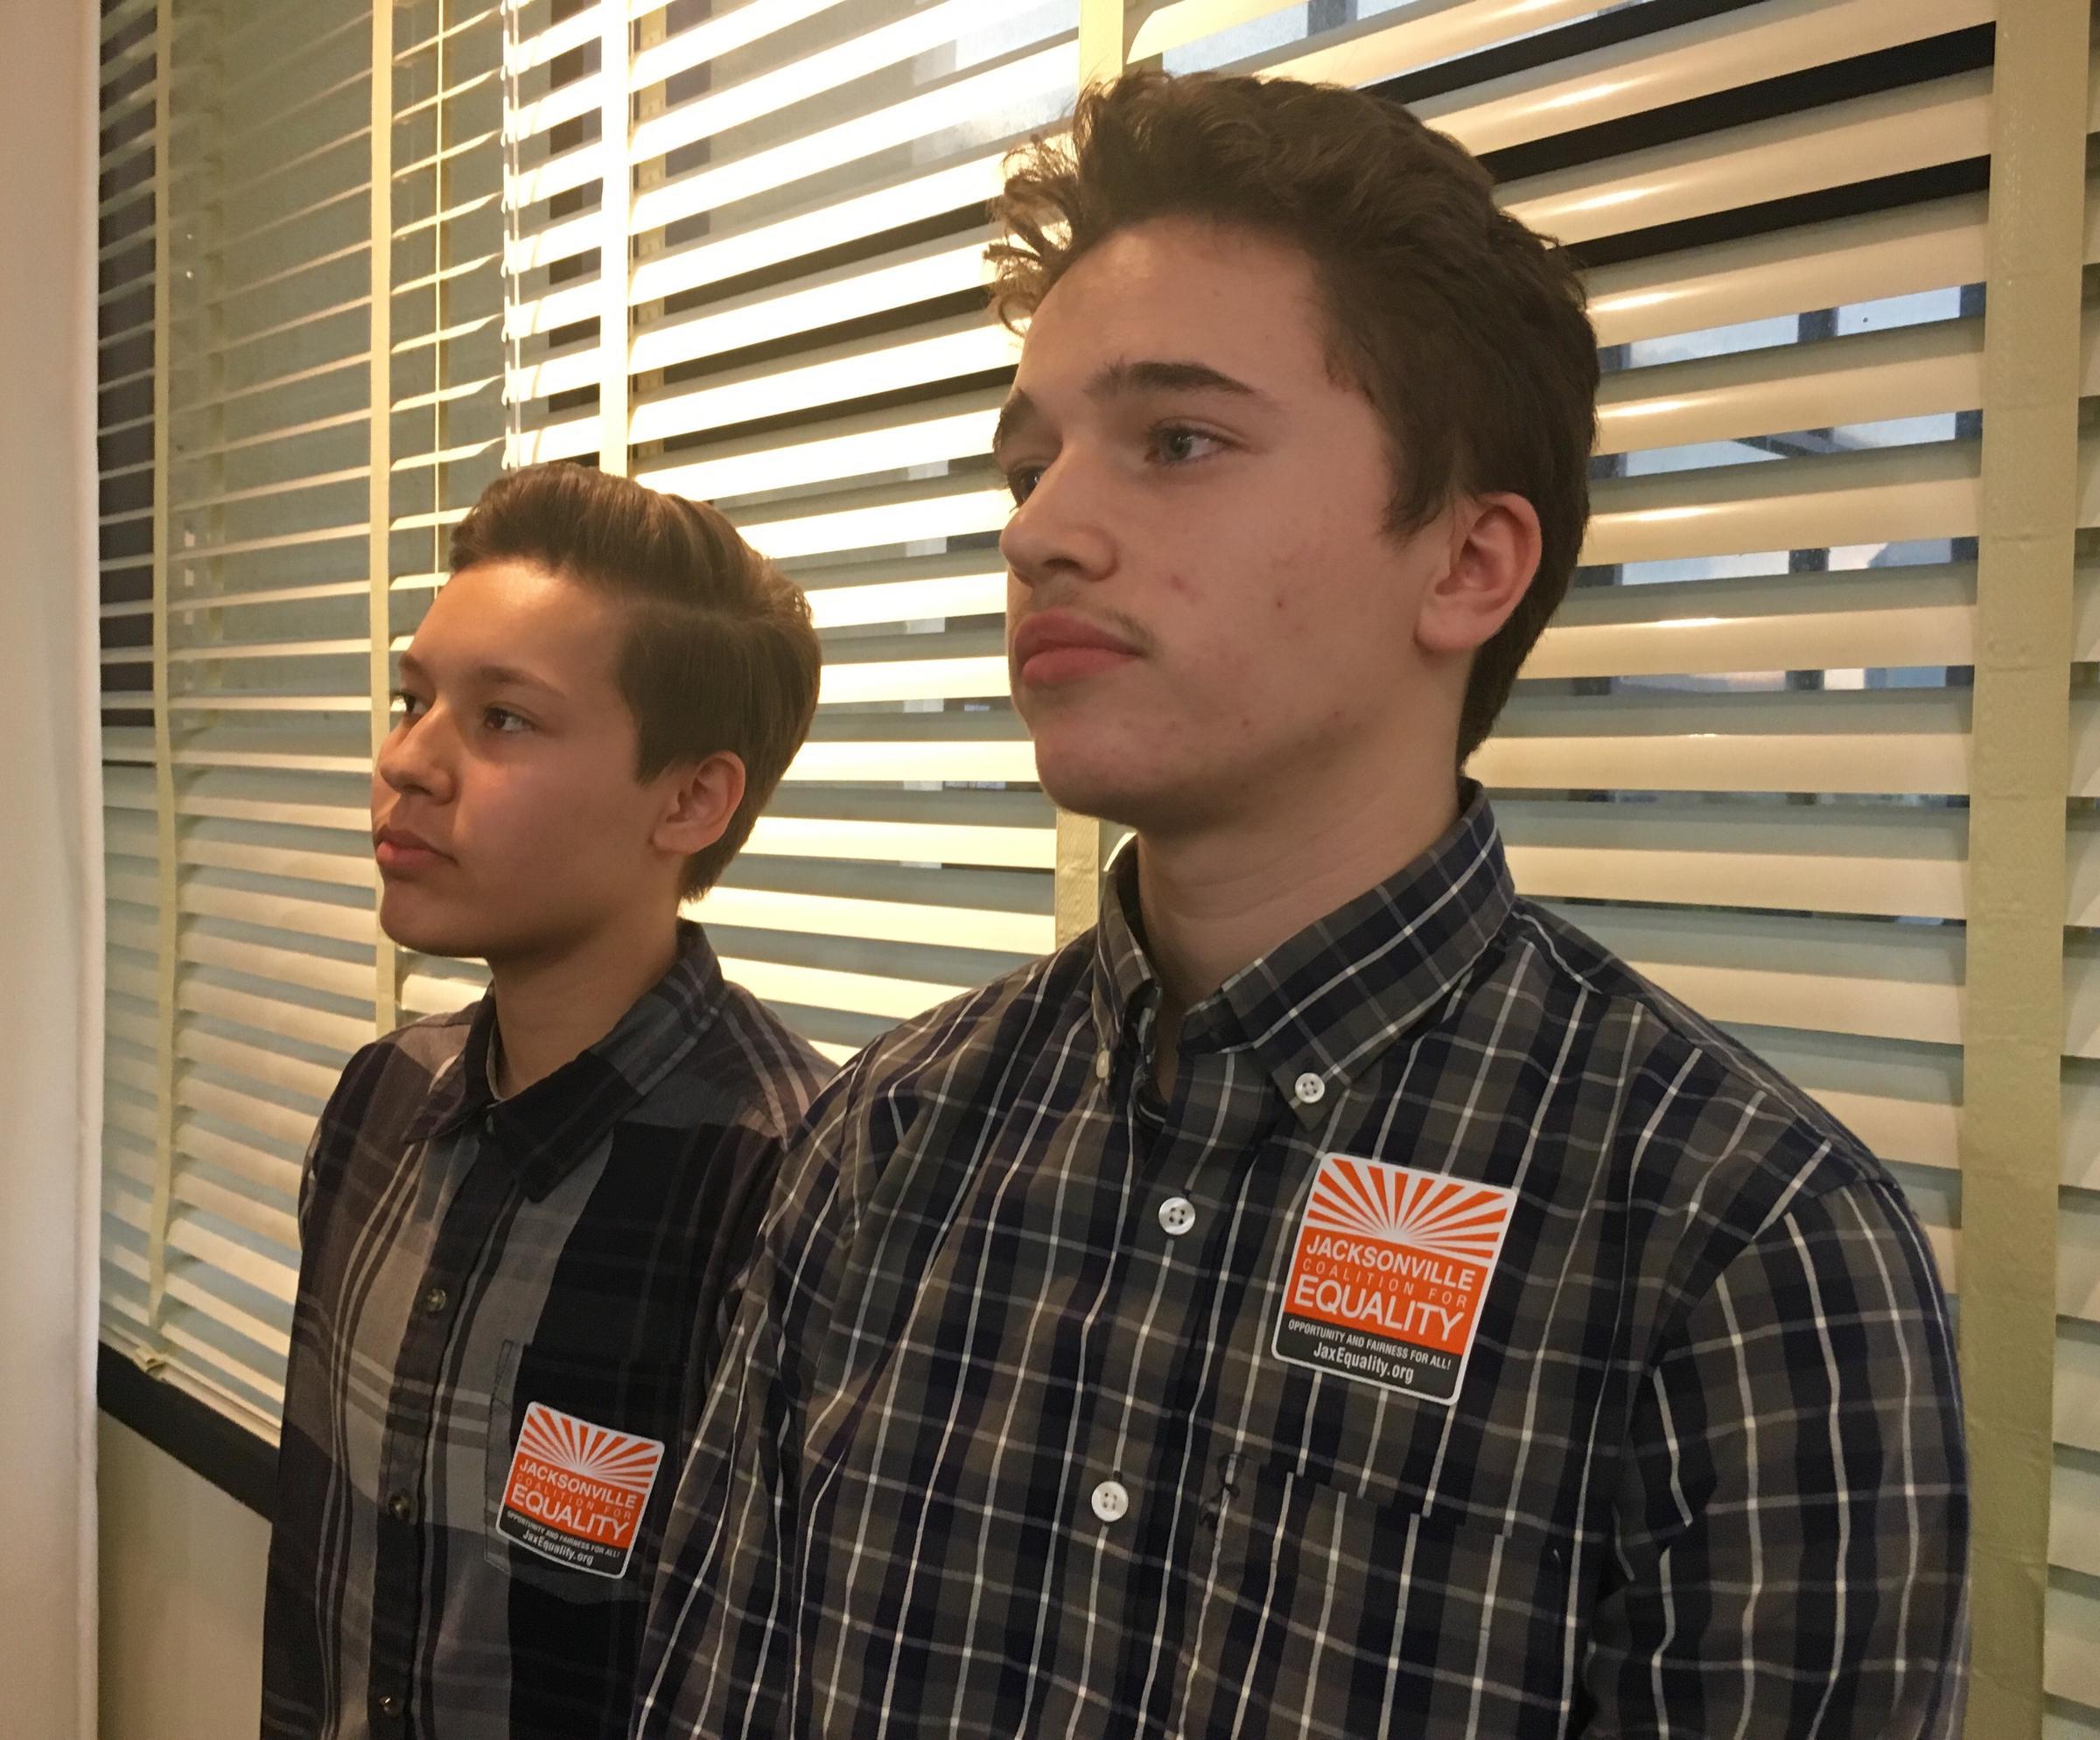 Jacksonville Area School Board Sued for Discriminating Against Transgender Student